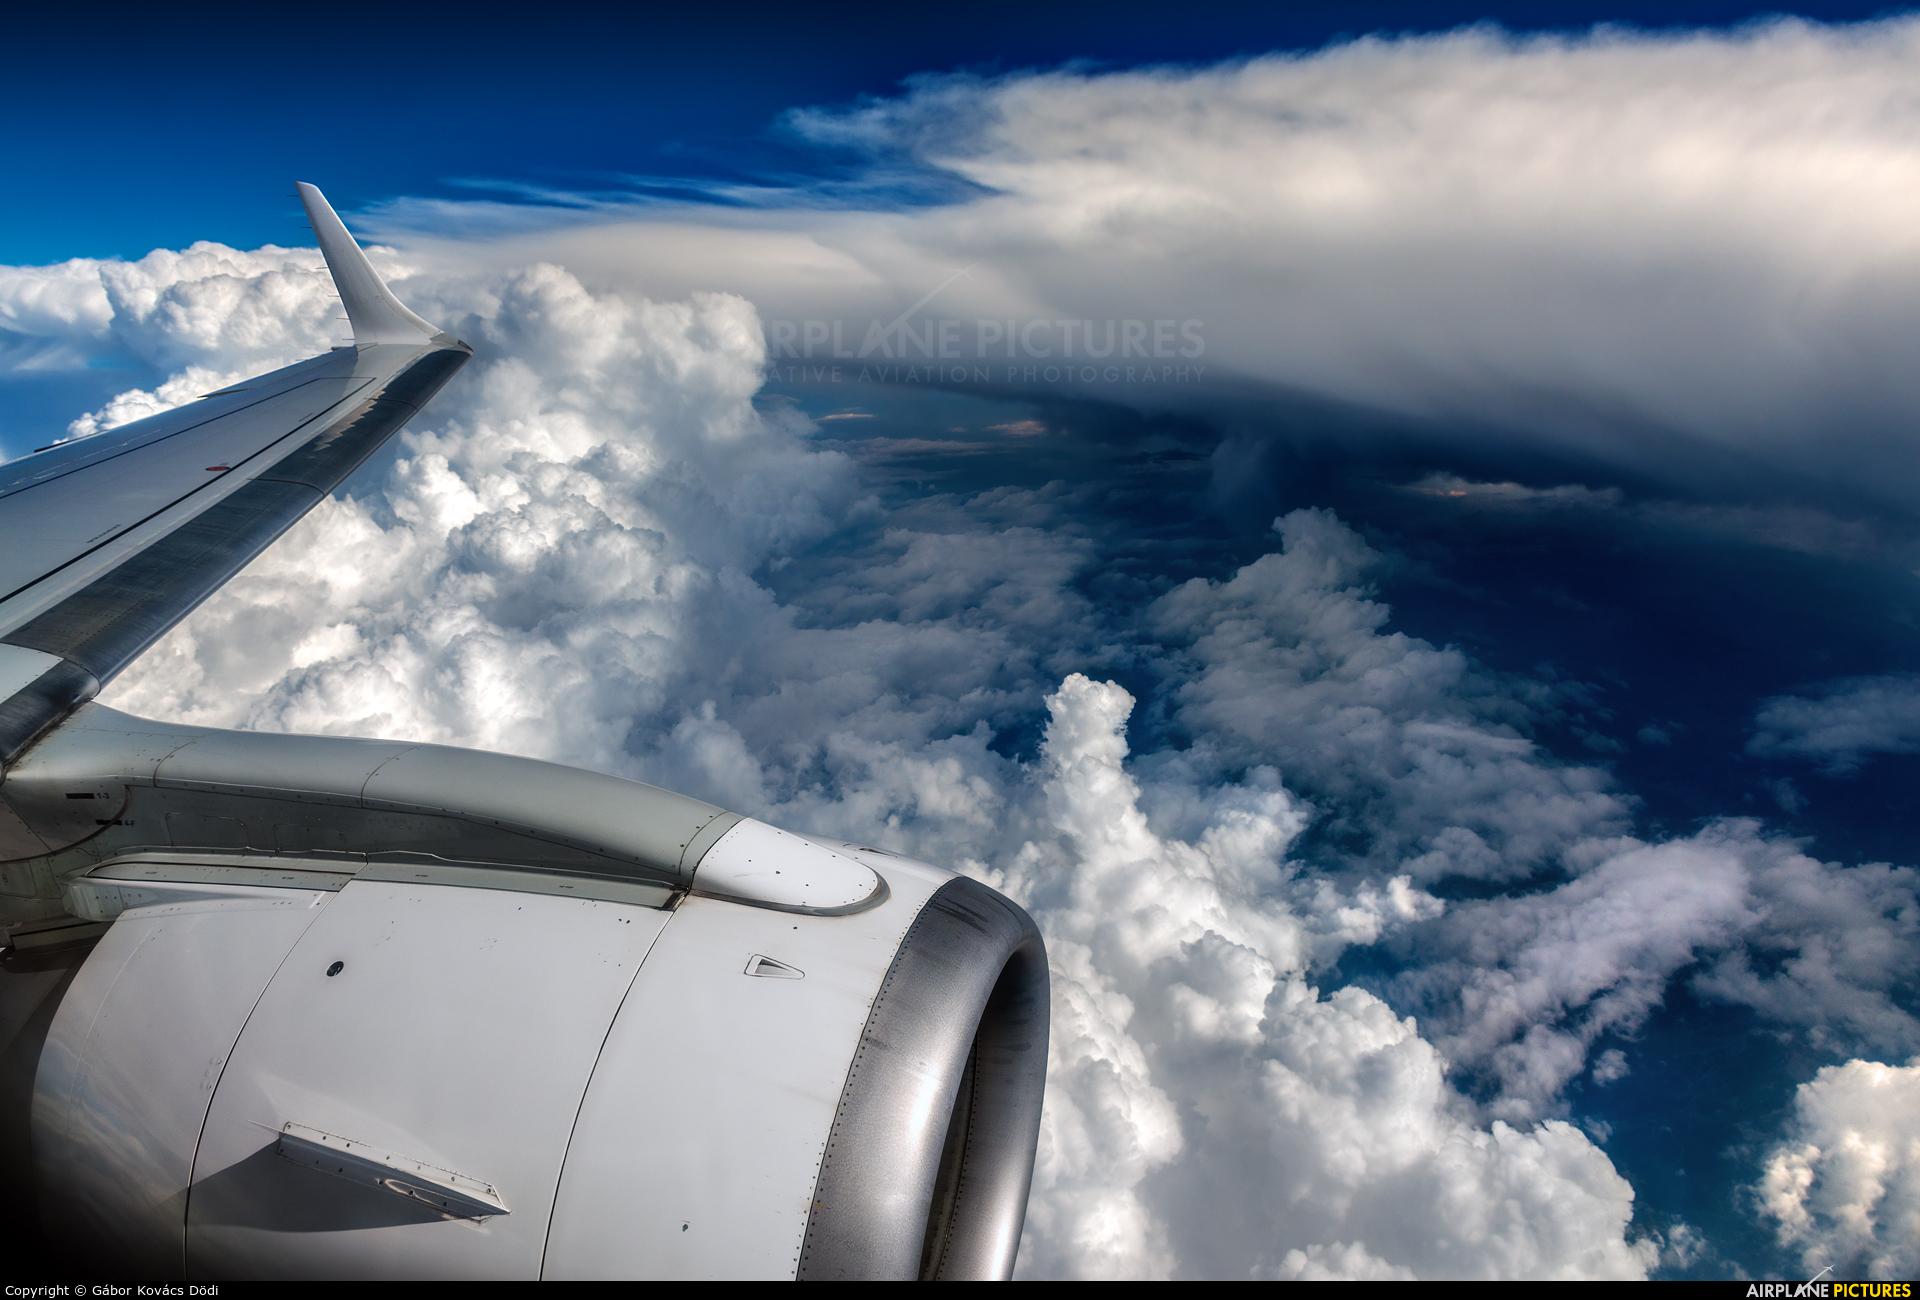 Lufthansa Regional - CityLine D-AEBB aircraft at In Flight - France